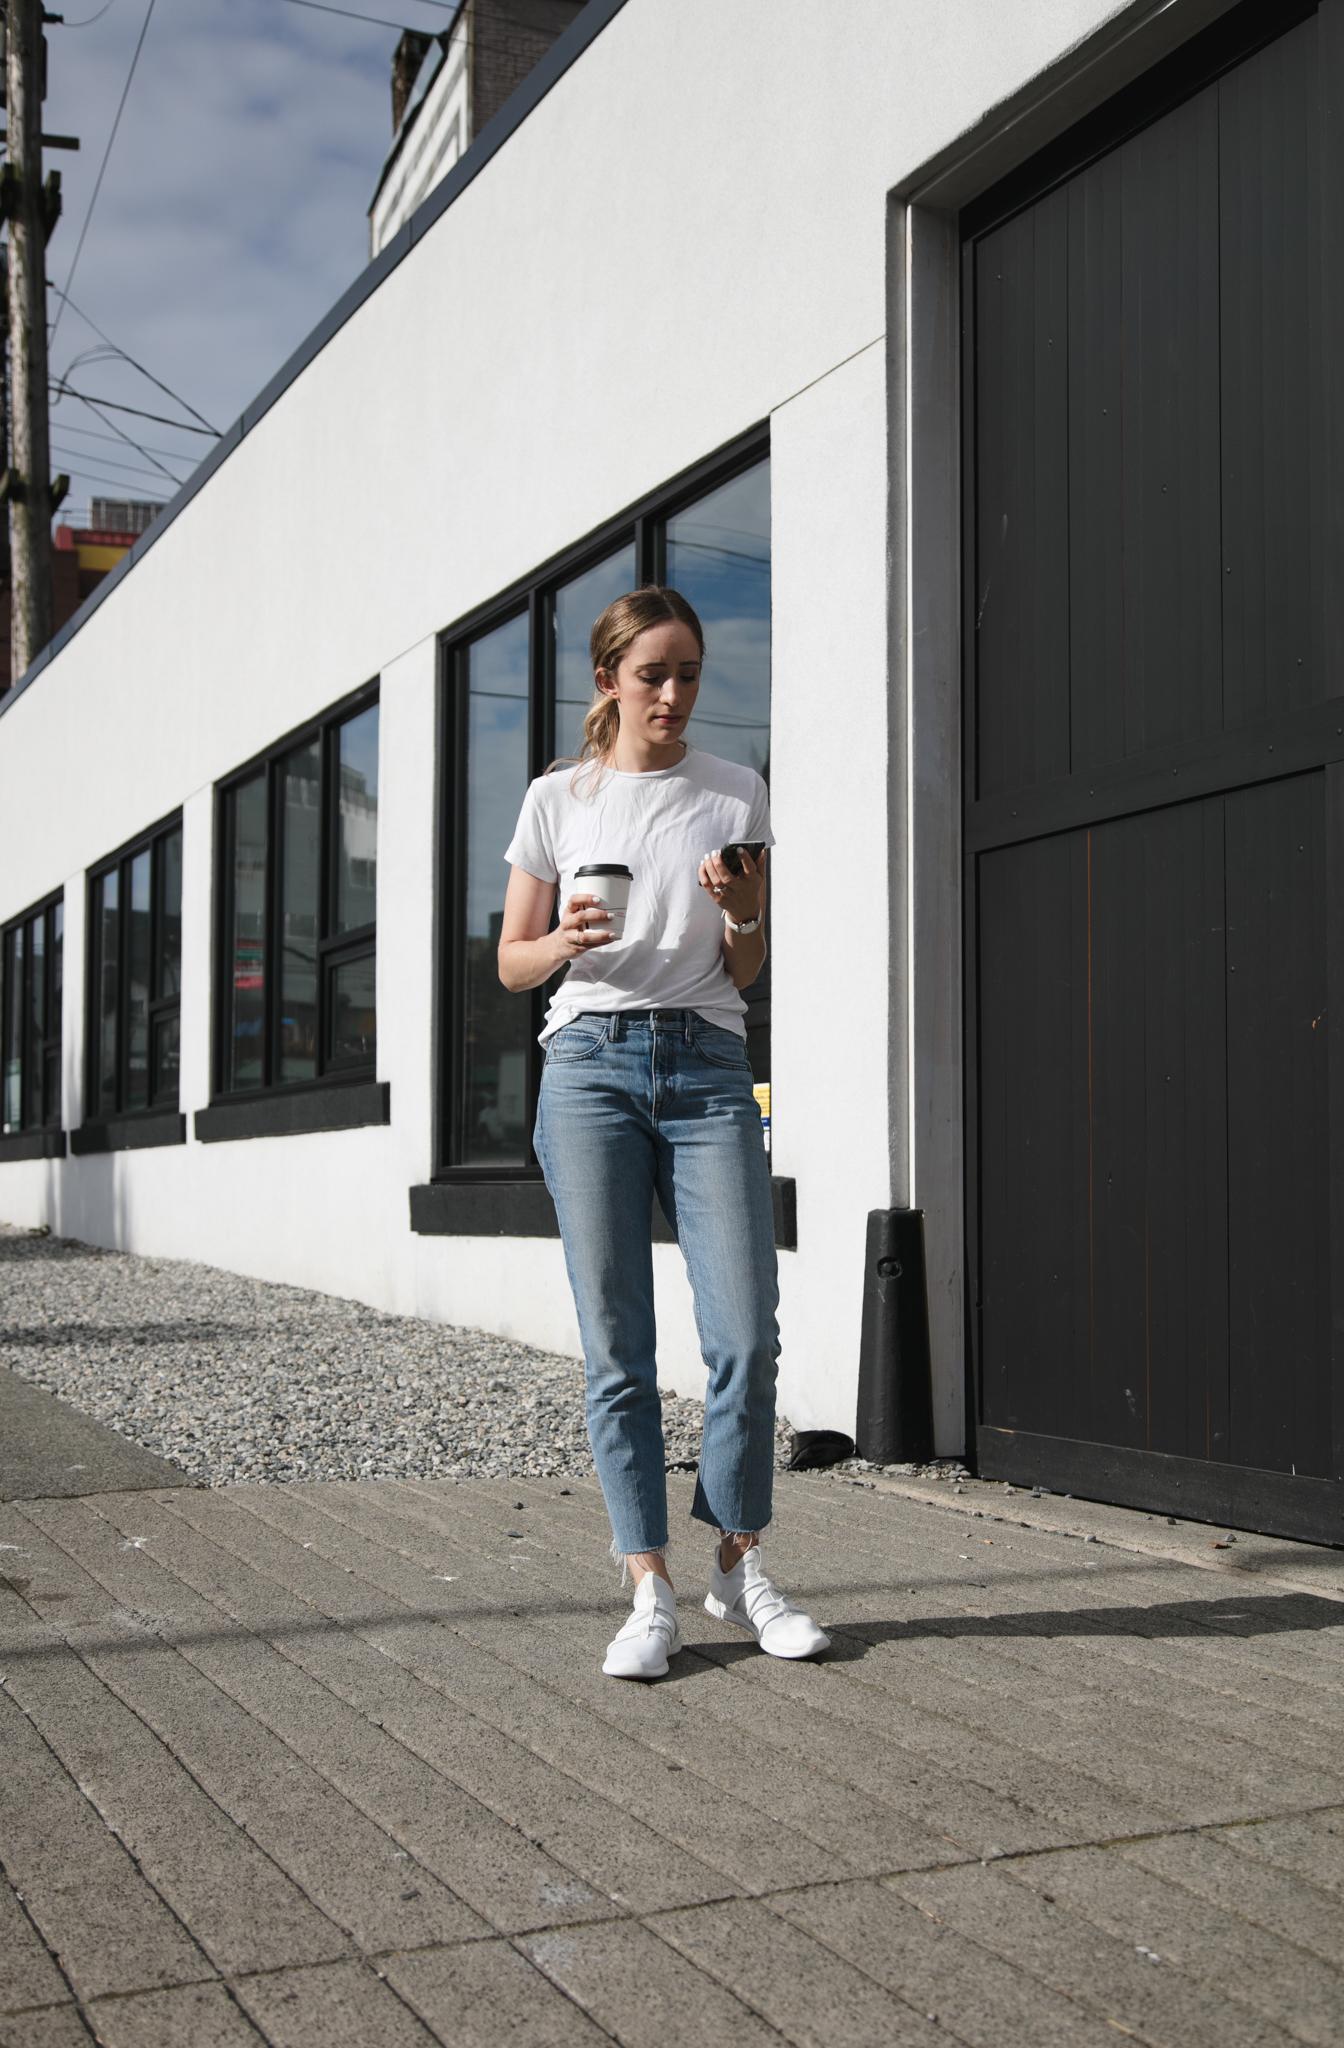 Zara basic tee ( similar ) /  Helmut Lang jeans  /  Skye Footwear 'Rbutus' sneaker  /  Daniel Wellington watch  (enter to win below)